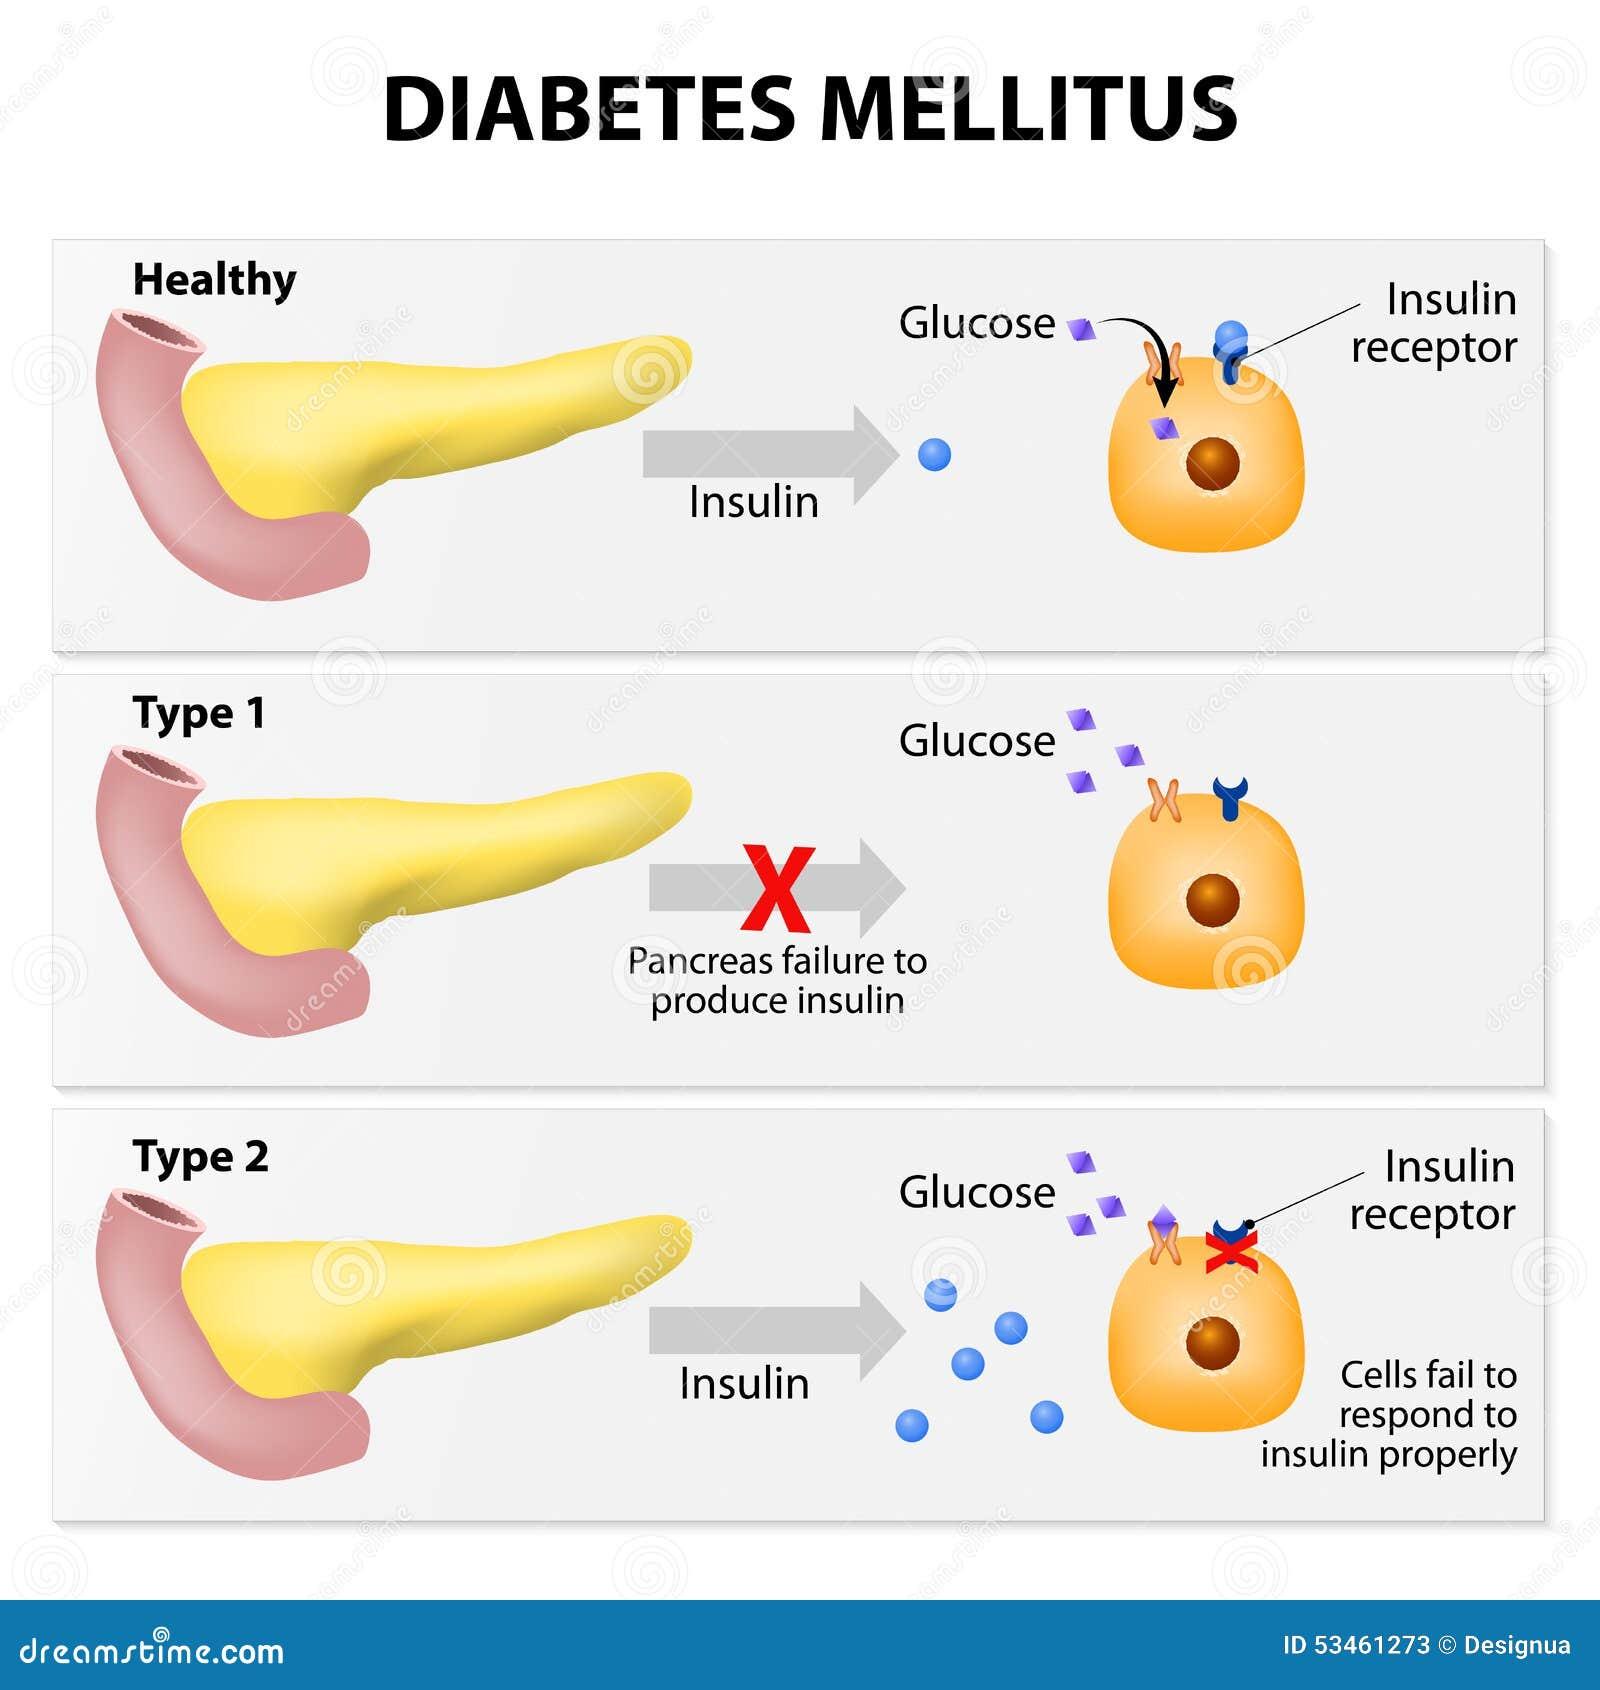 of diabetes mellitus. Either the pancreas not producing enough insulin ...